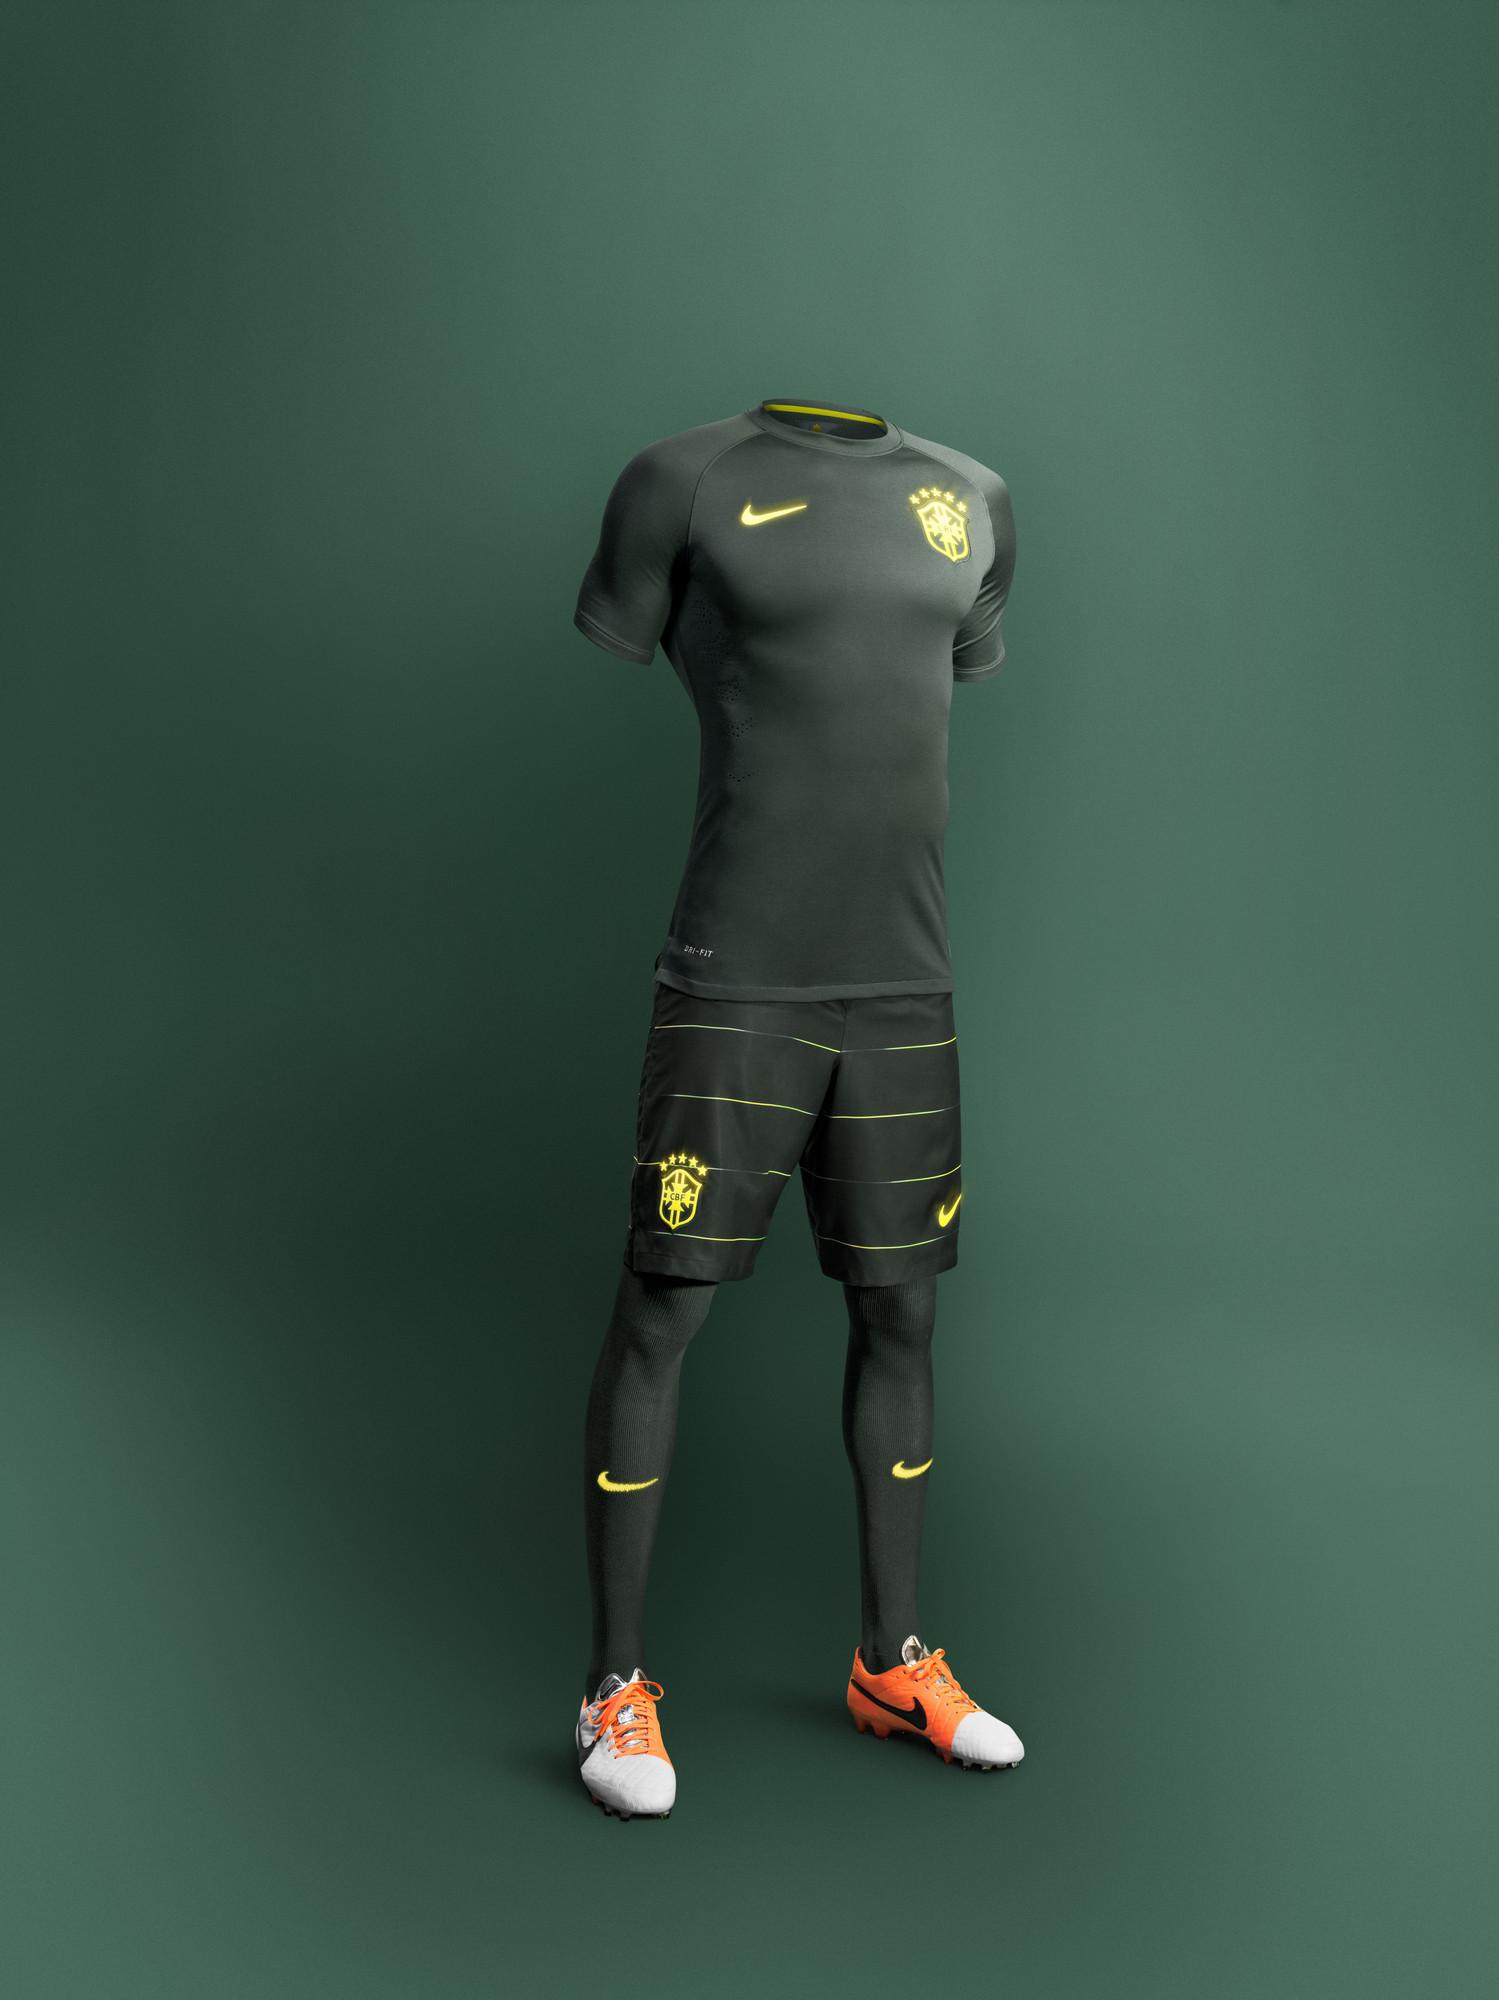 6975155e26 Maillot Third du Brésil (Nike)